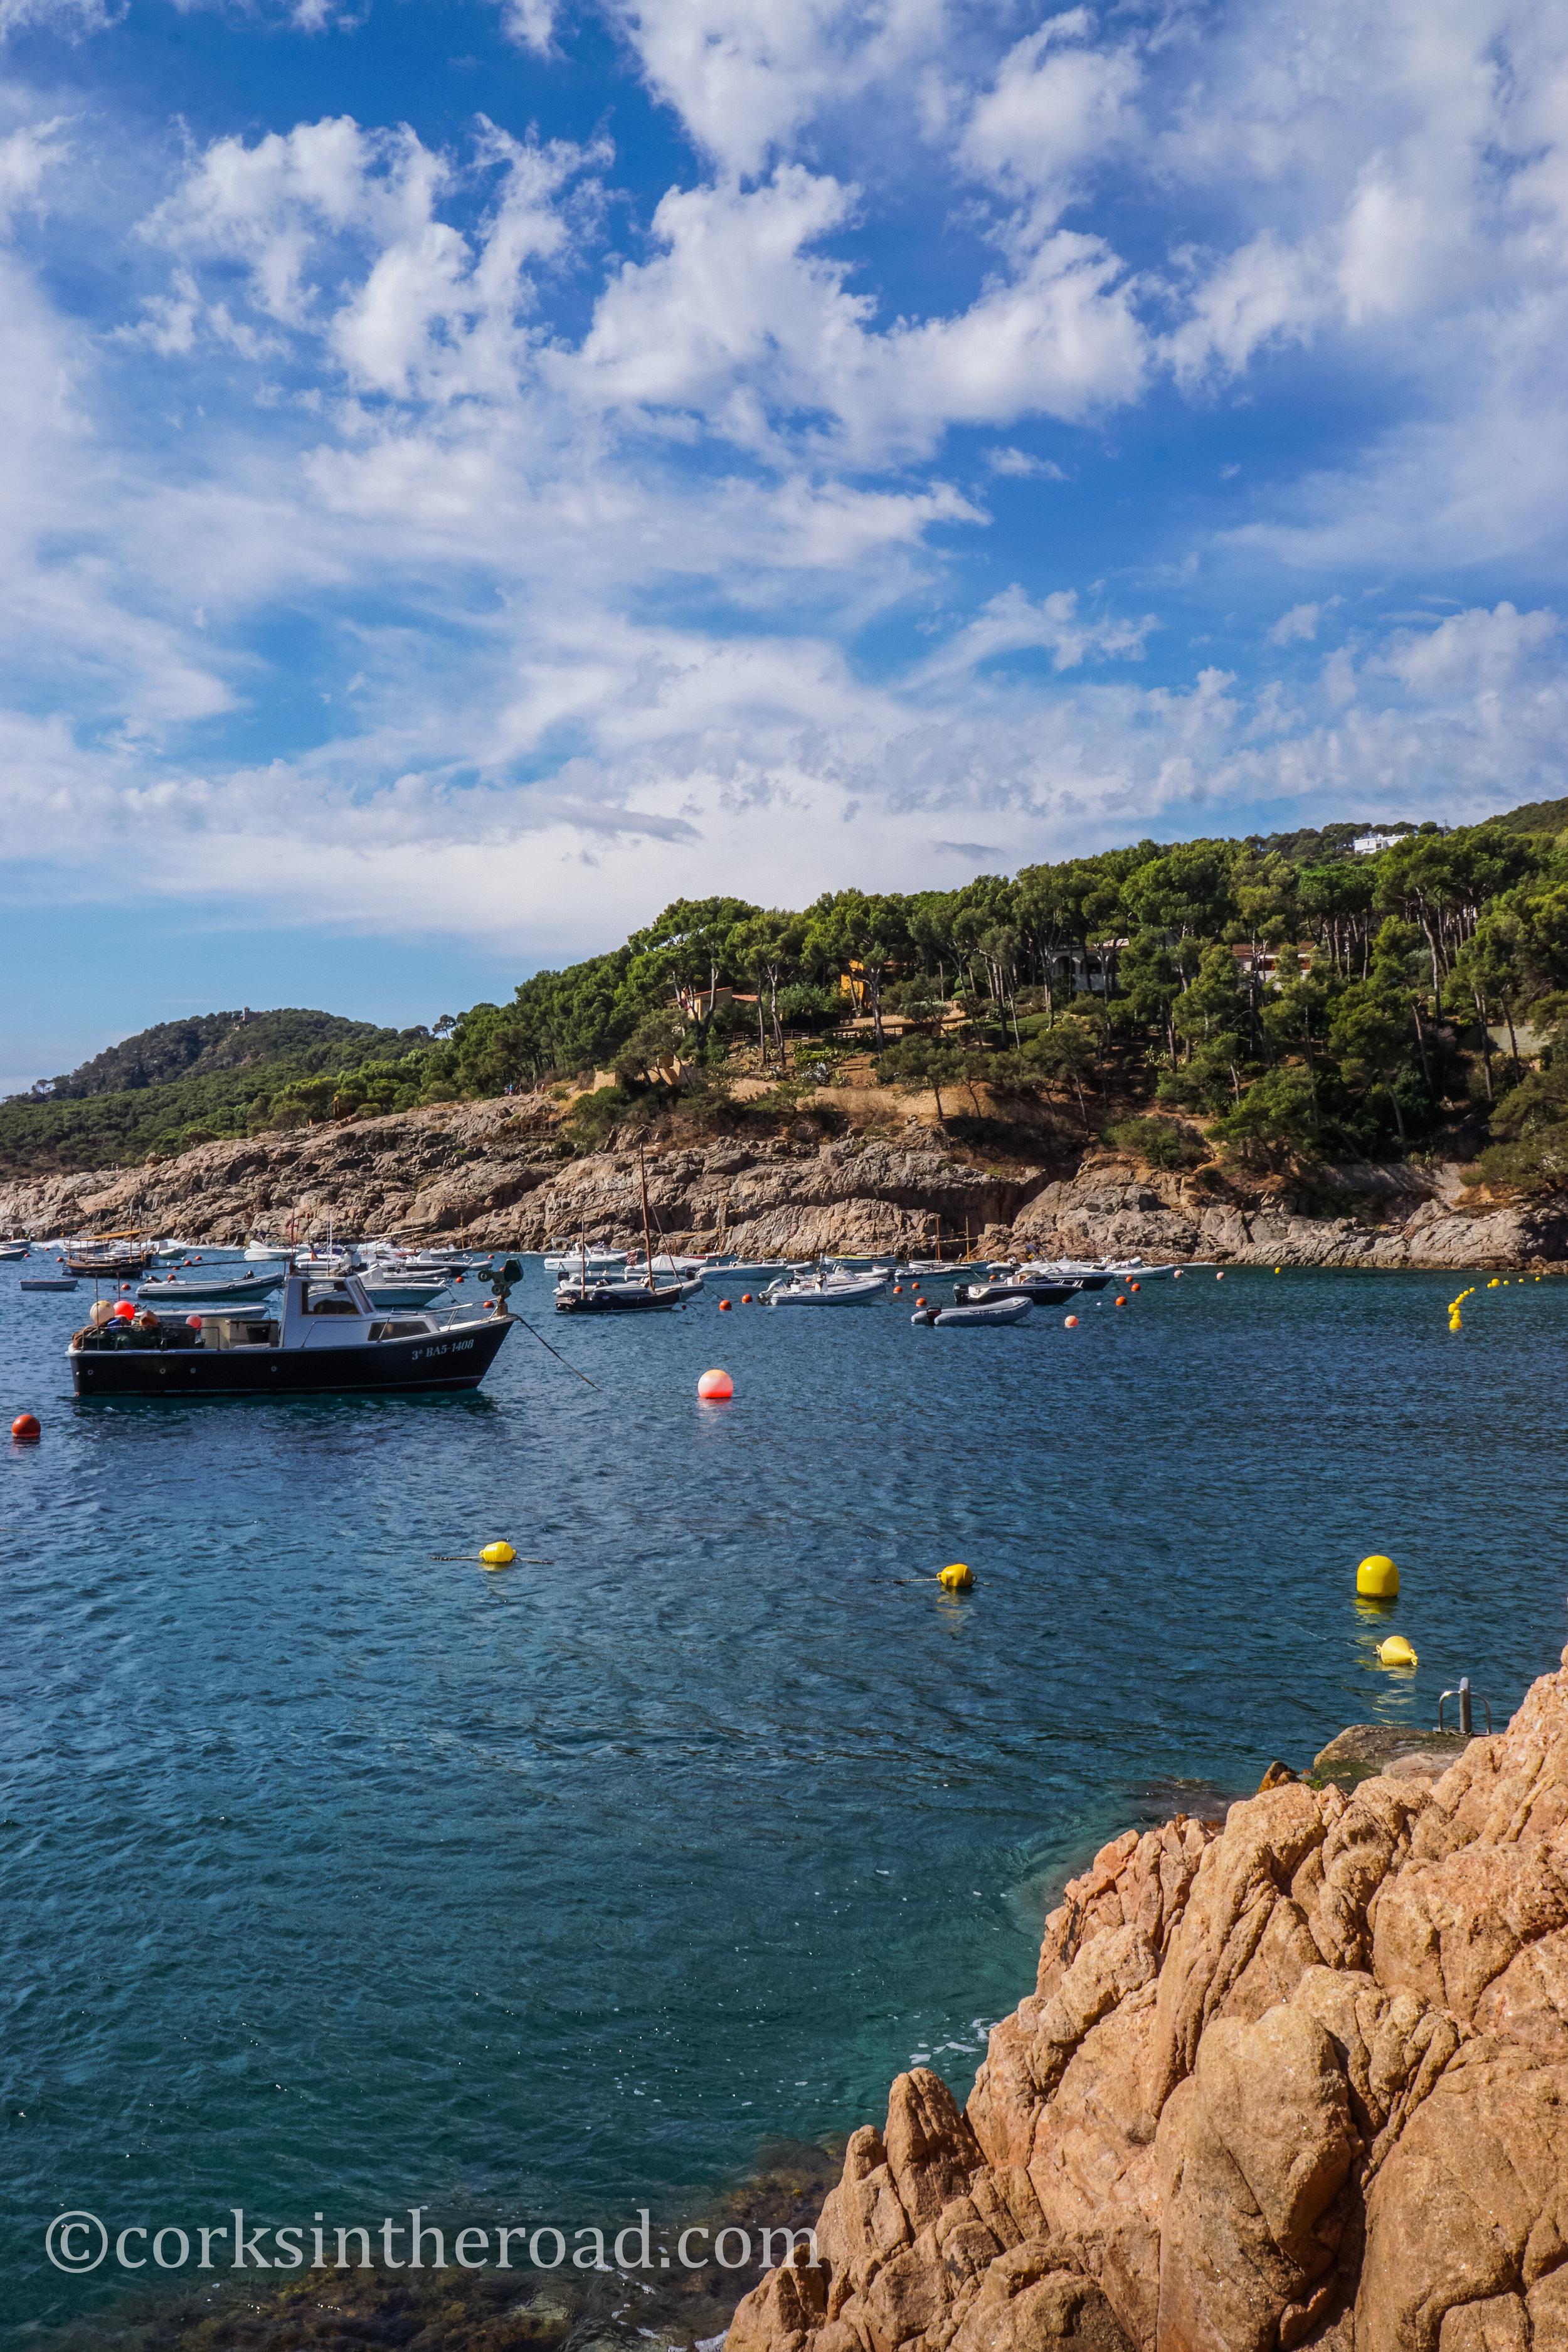 20160810Barcelona, Corksintheroad, Costa Brava, Costa Brava Landscape-5.jpg